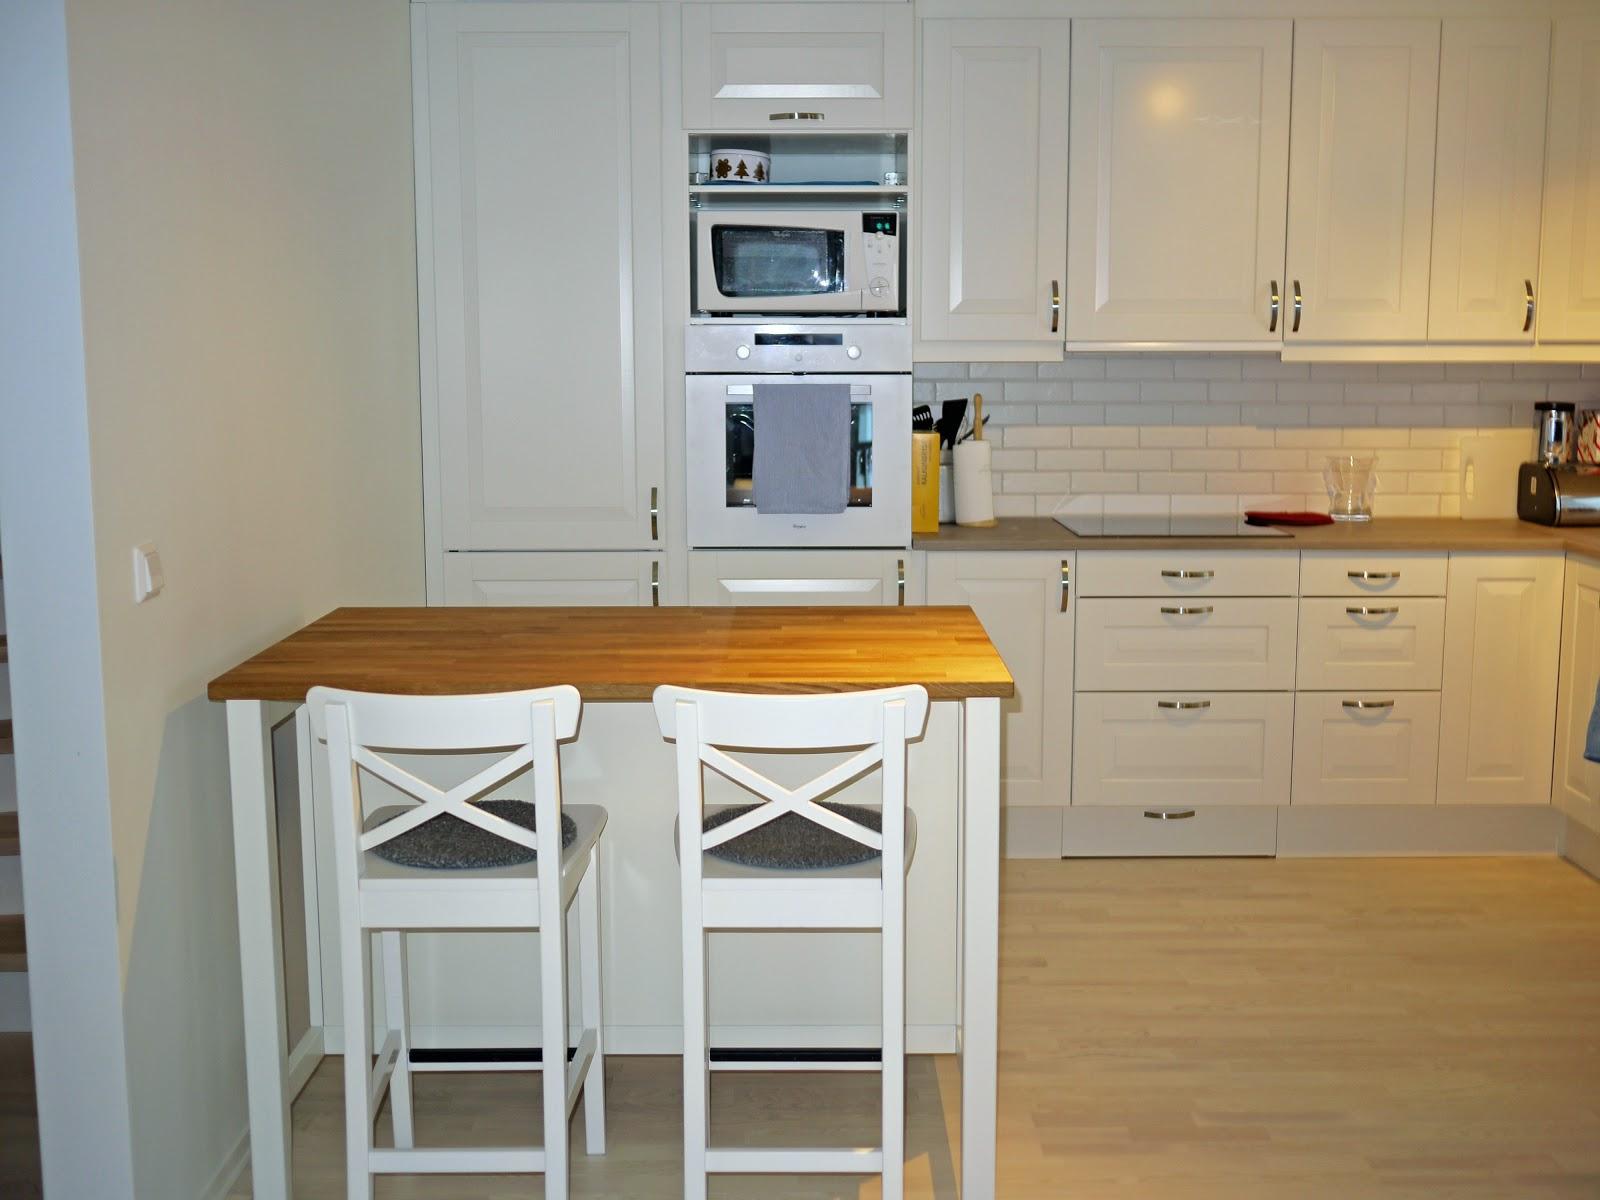 Ikea kj kken y materialvalg for baderomsm bler - Bancone da cucina ...